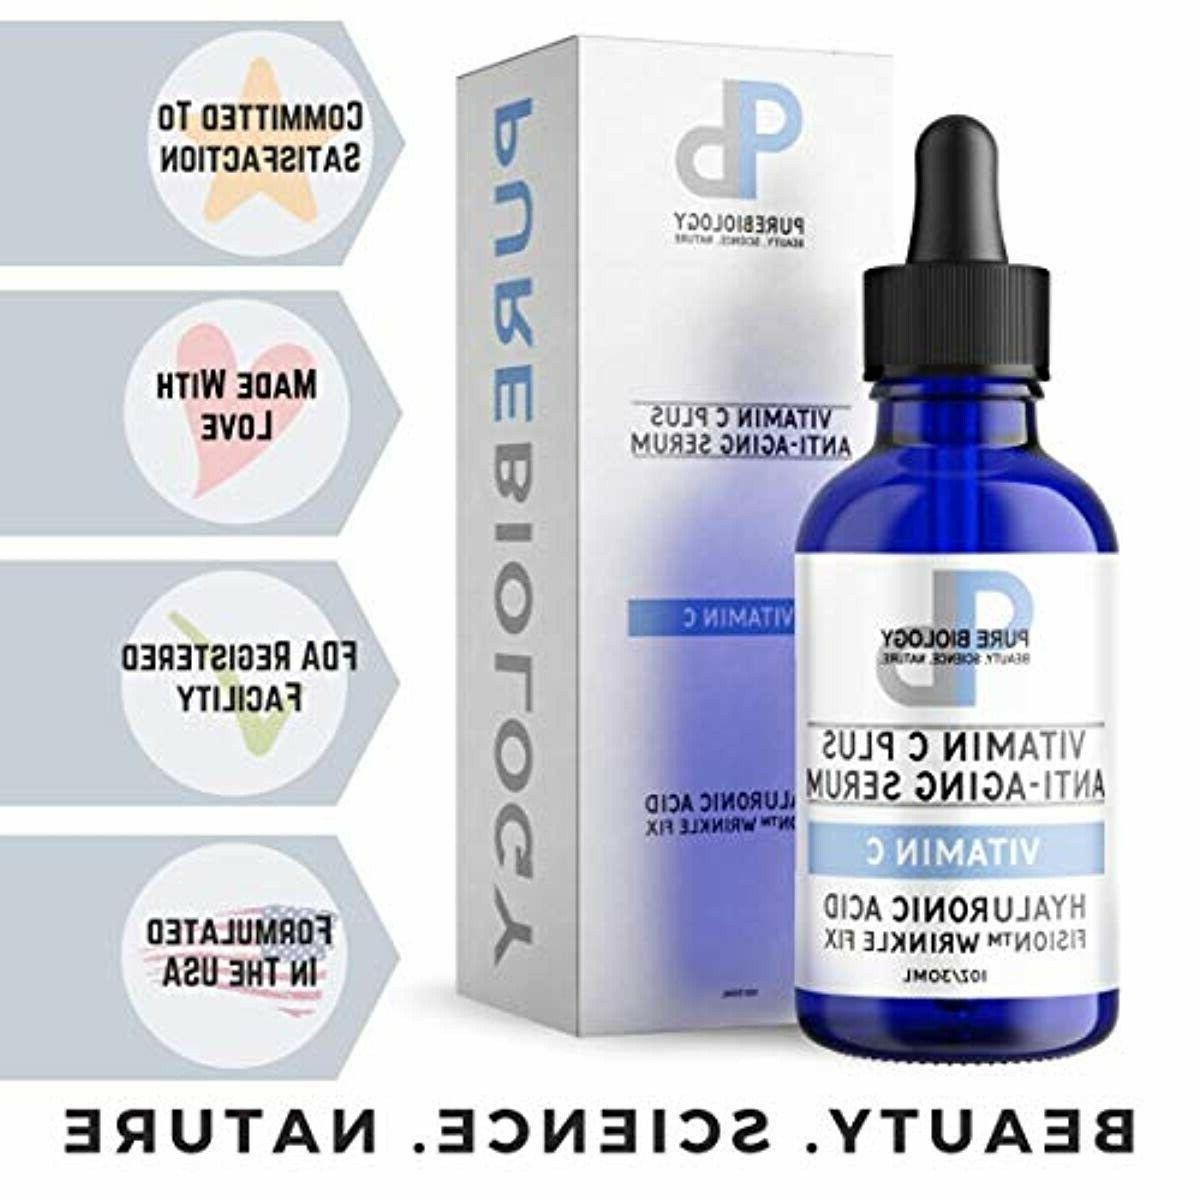 Pure Biology C with Acid, Witch Hazel, Vitam